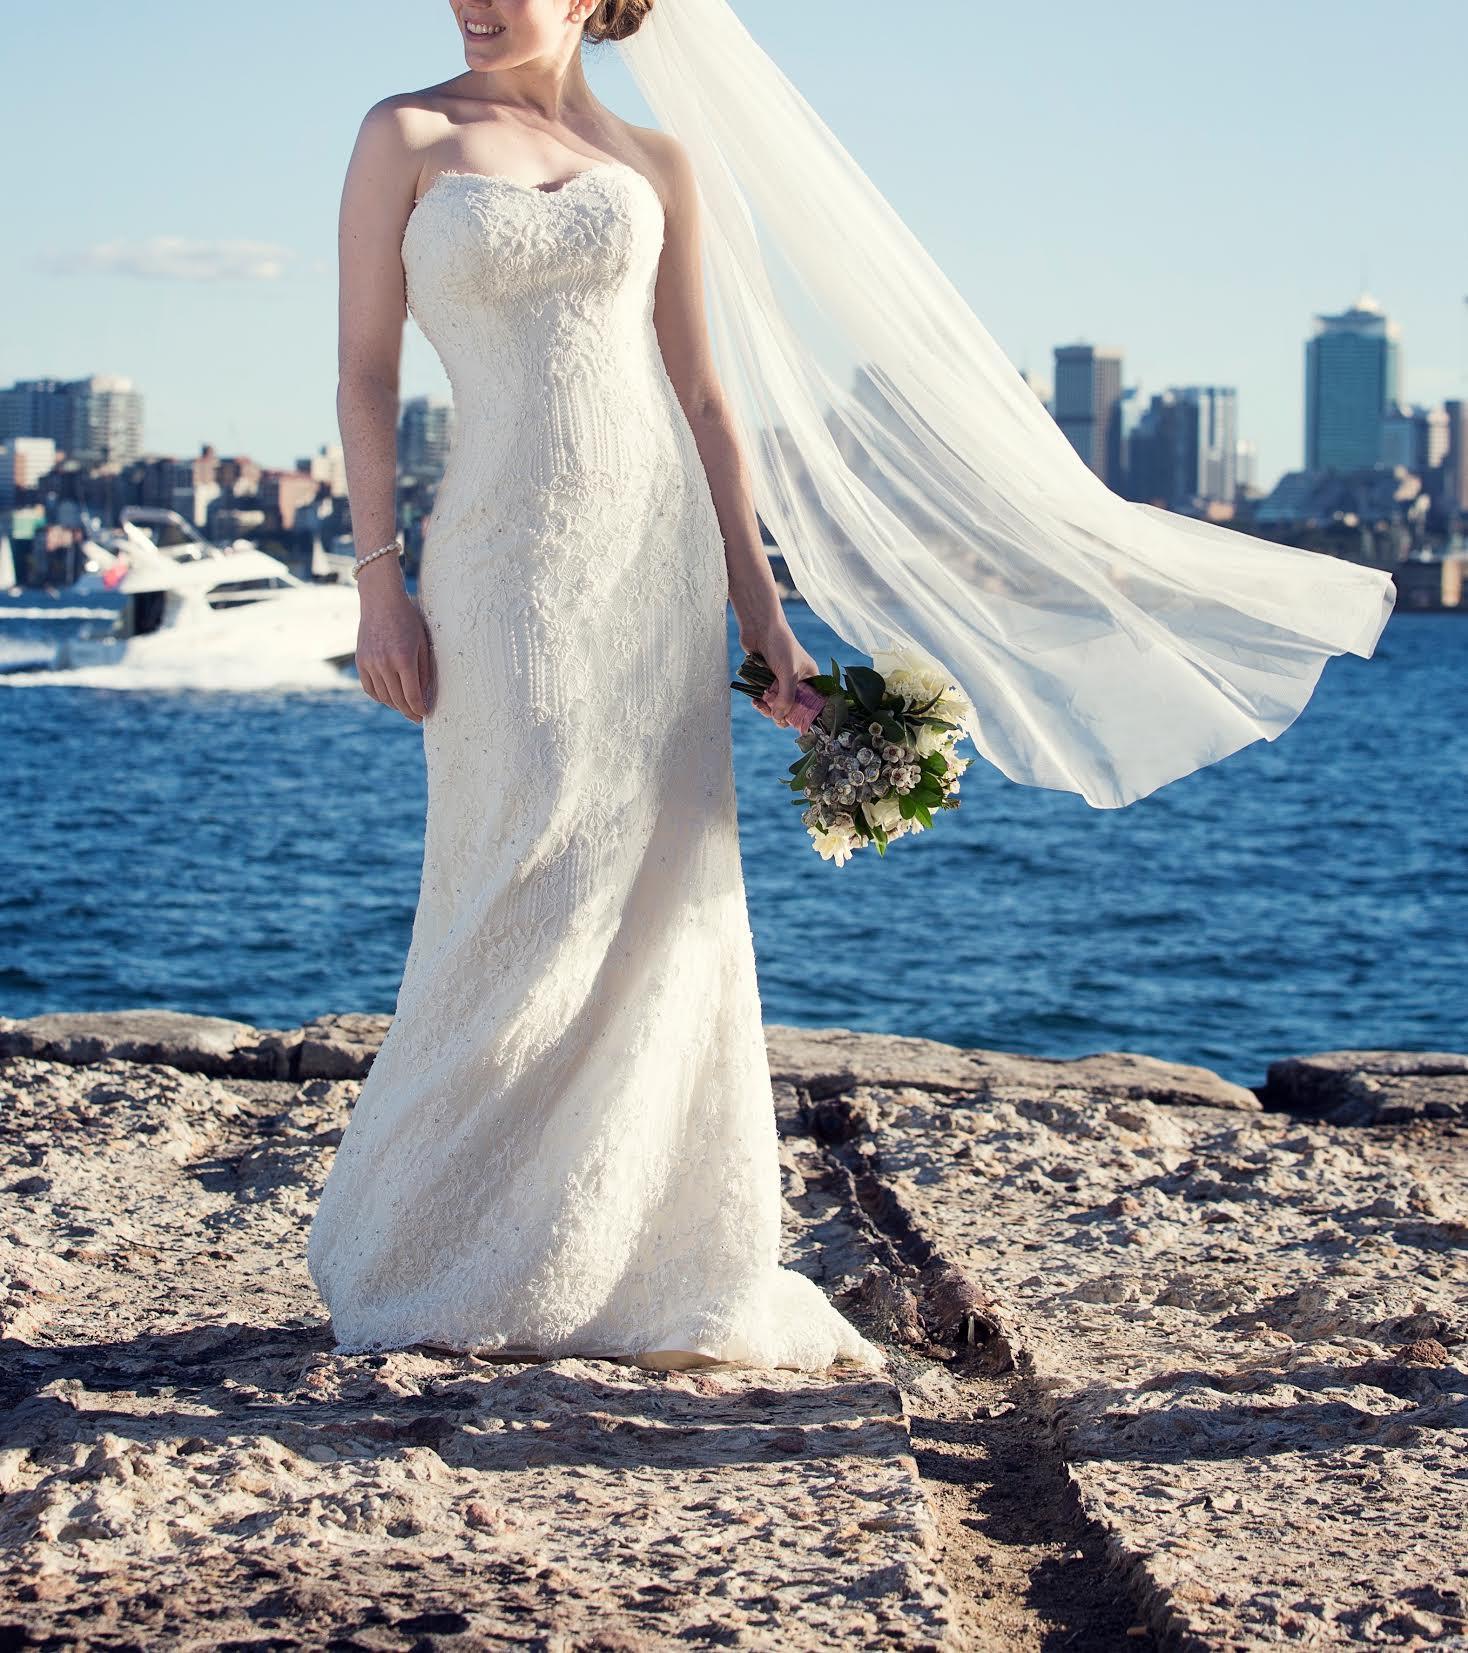 Martina Liana 423 Used Wedding Dress On Sale 70% Off